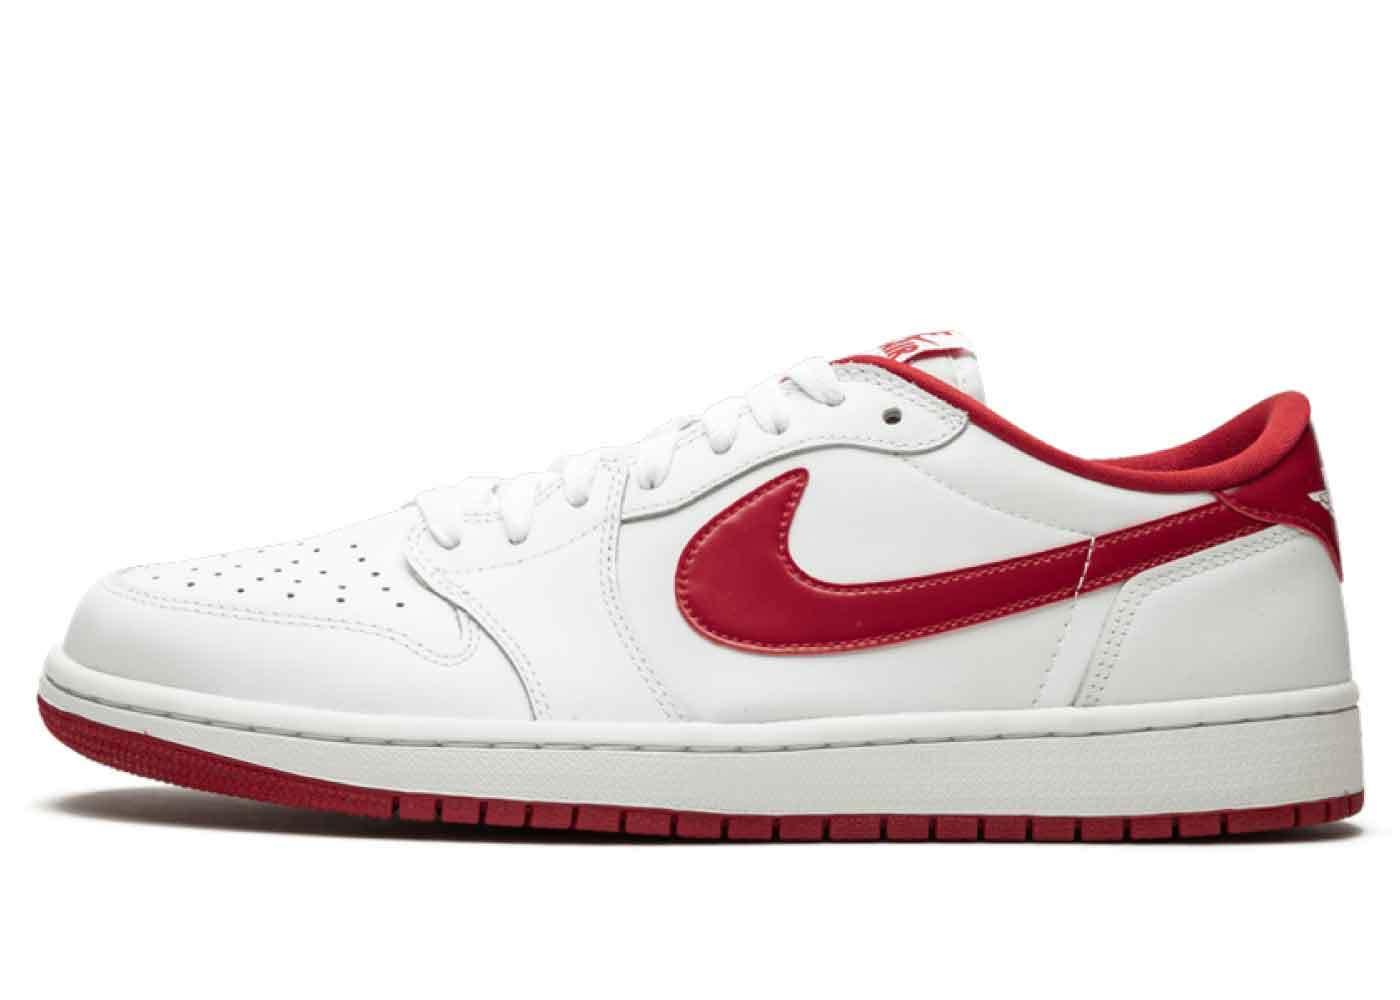 Nike Air Jordan 1 Retro Low White Varsity Redの写真